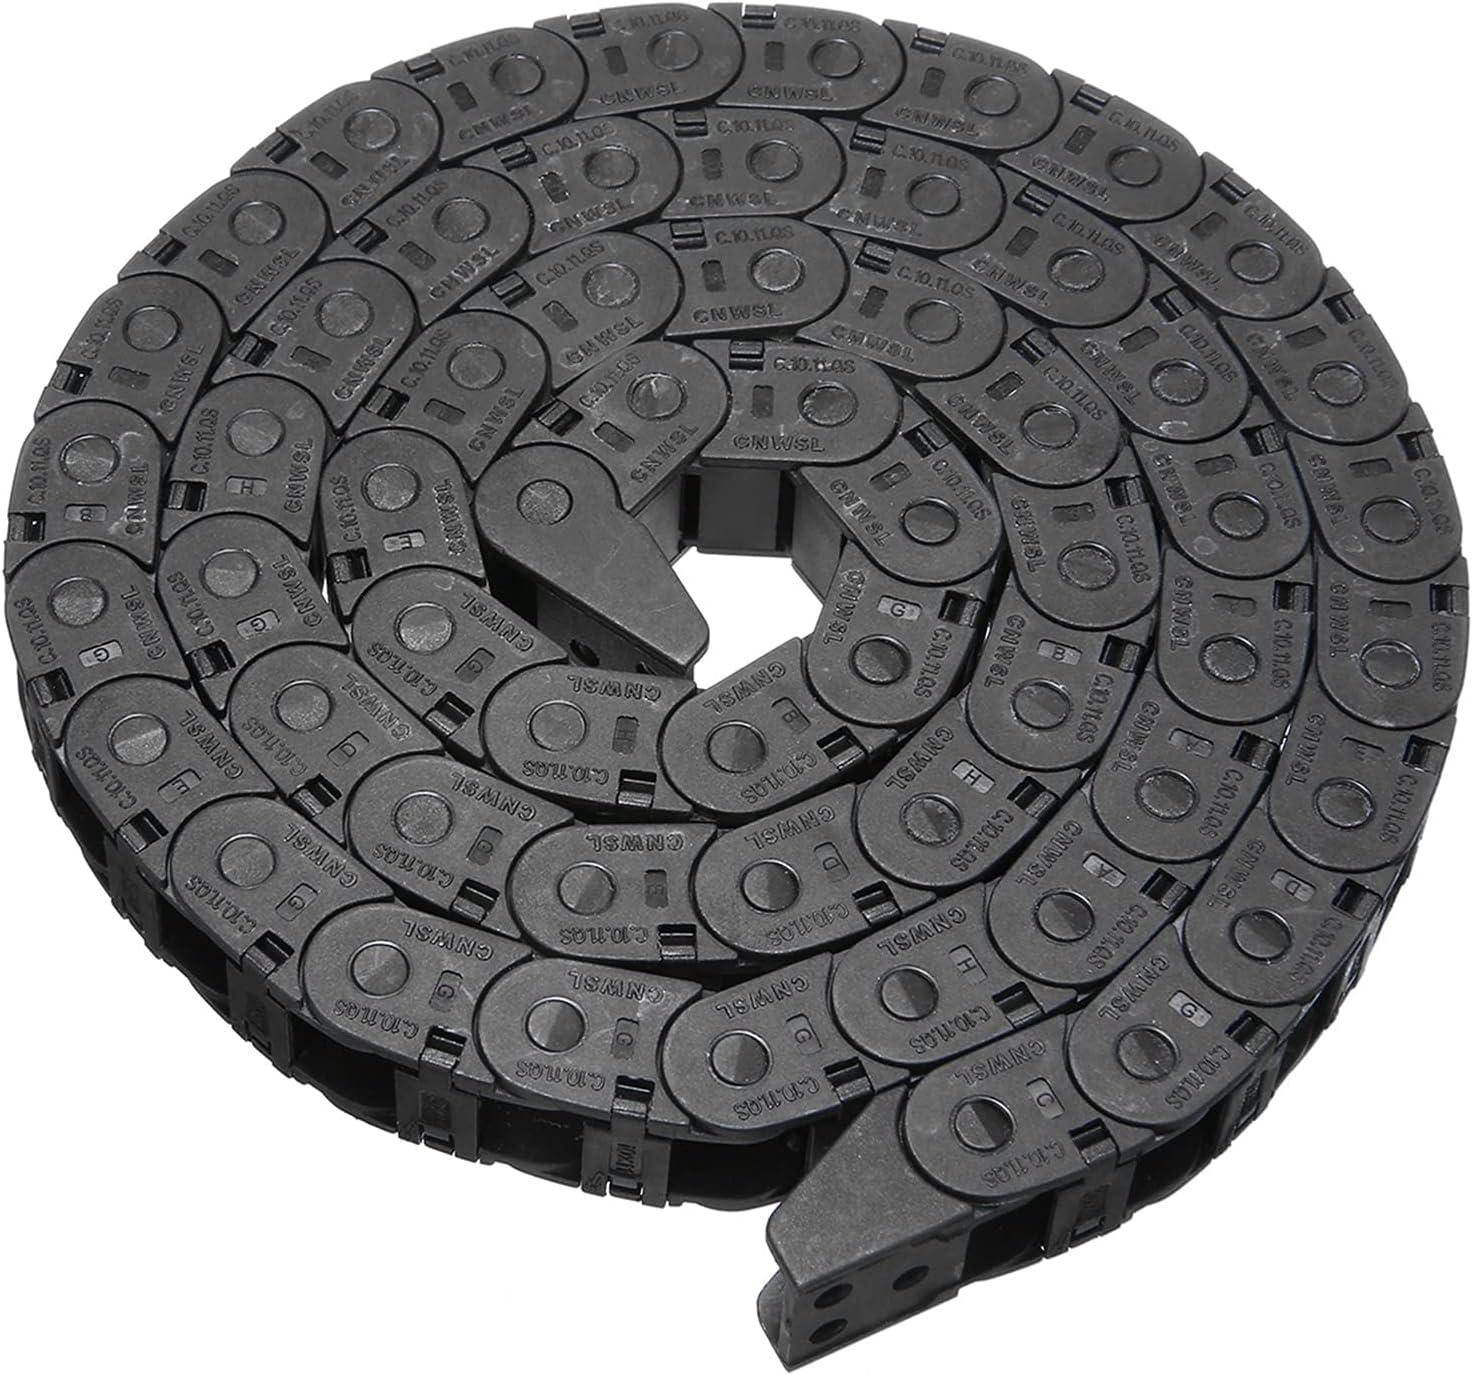 Drag Chain 10x11mm Mini Energy Chain Nylon Drag Chain CNC 3D Pri